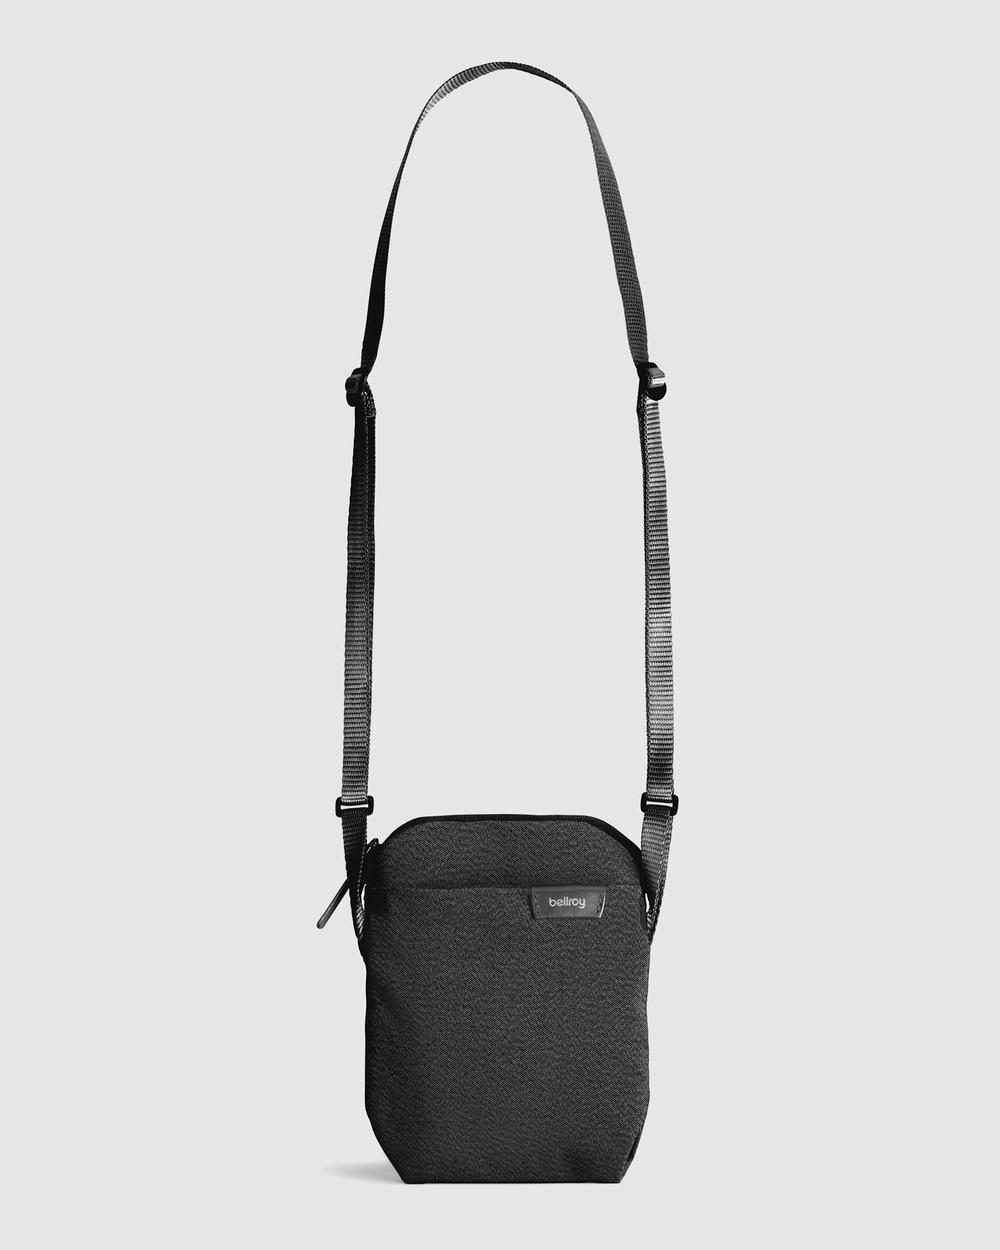 Bellroy City Pouch Bum Bags Black